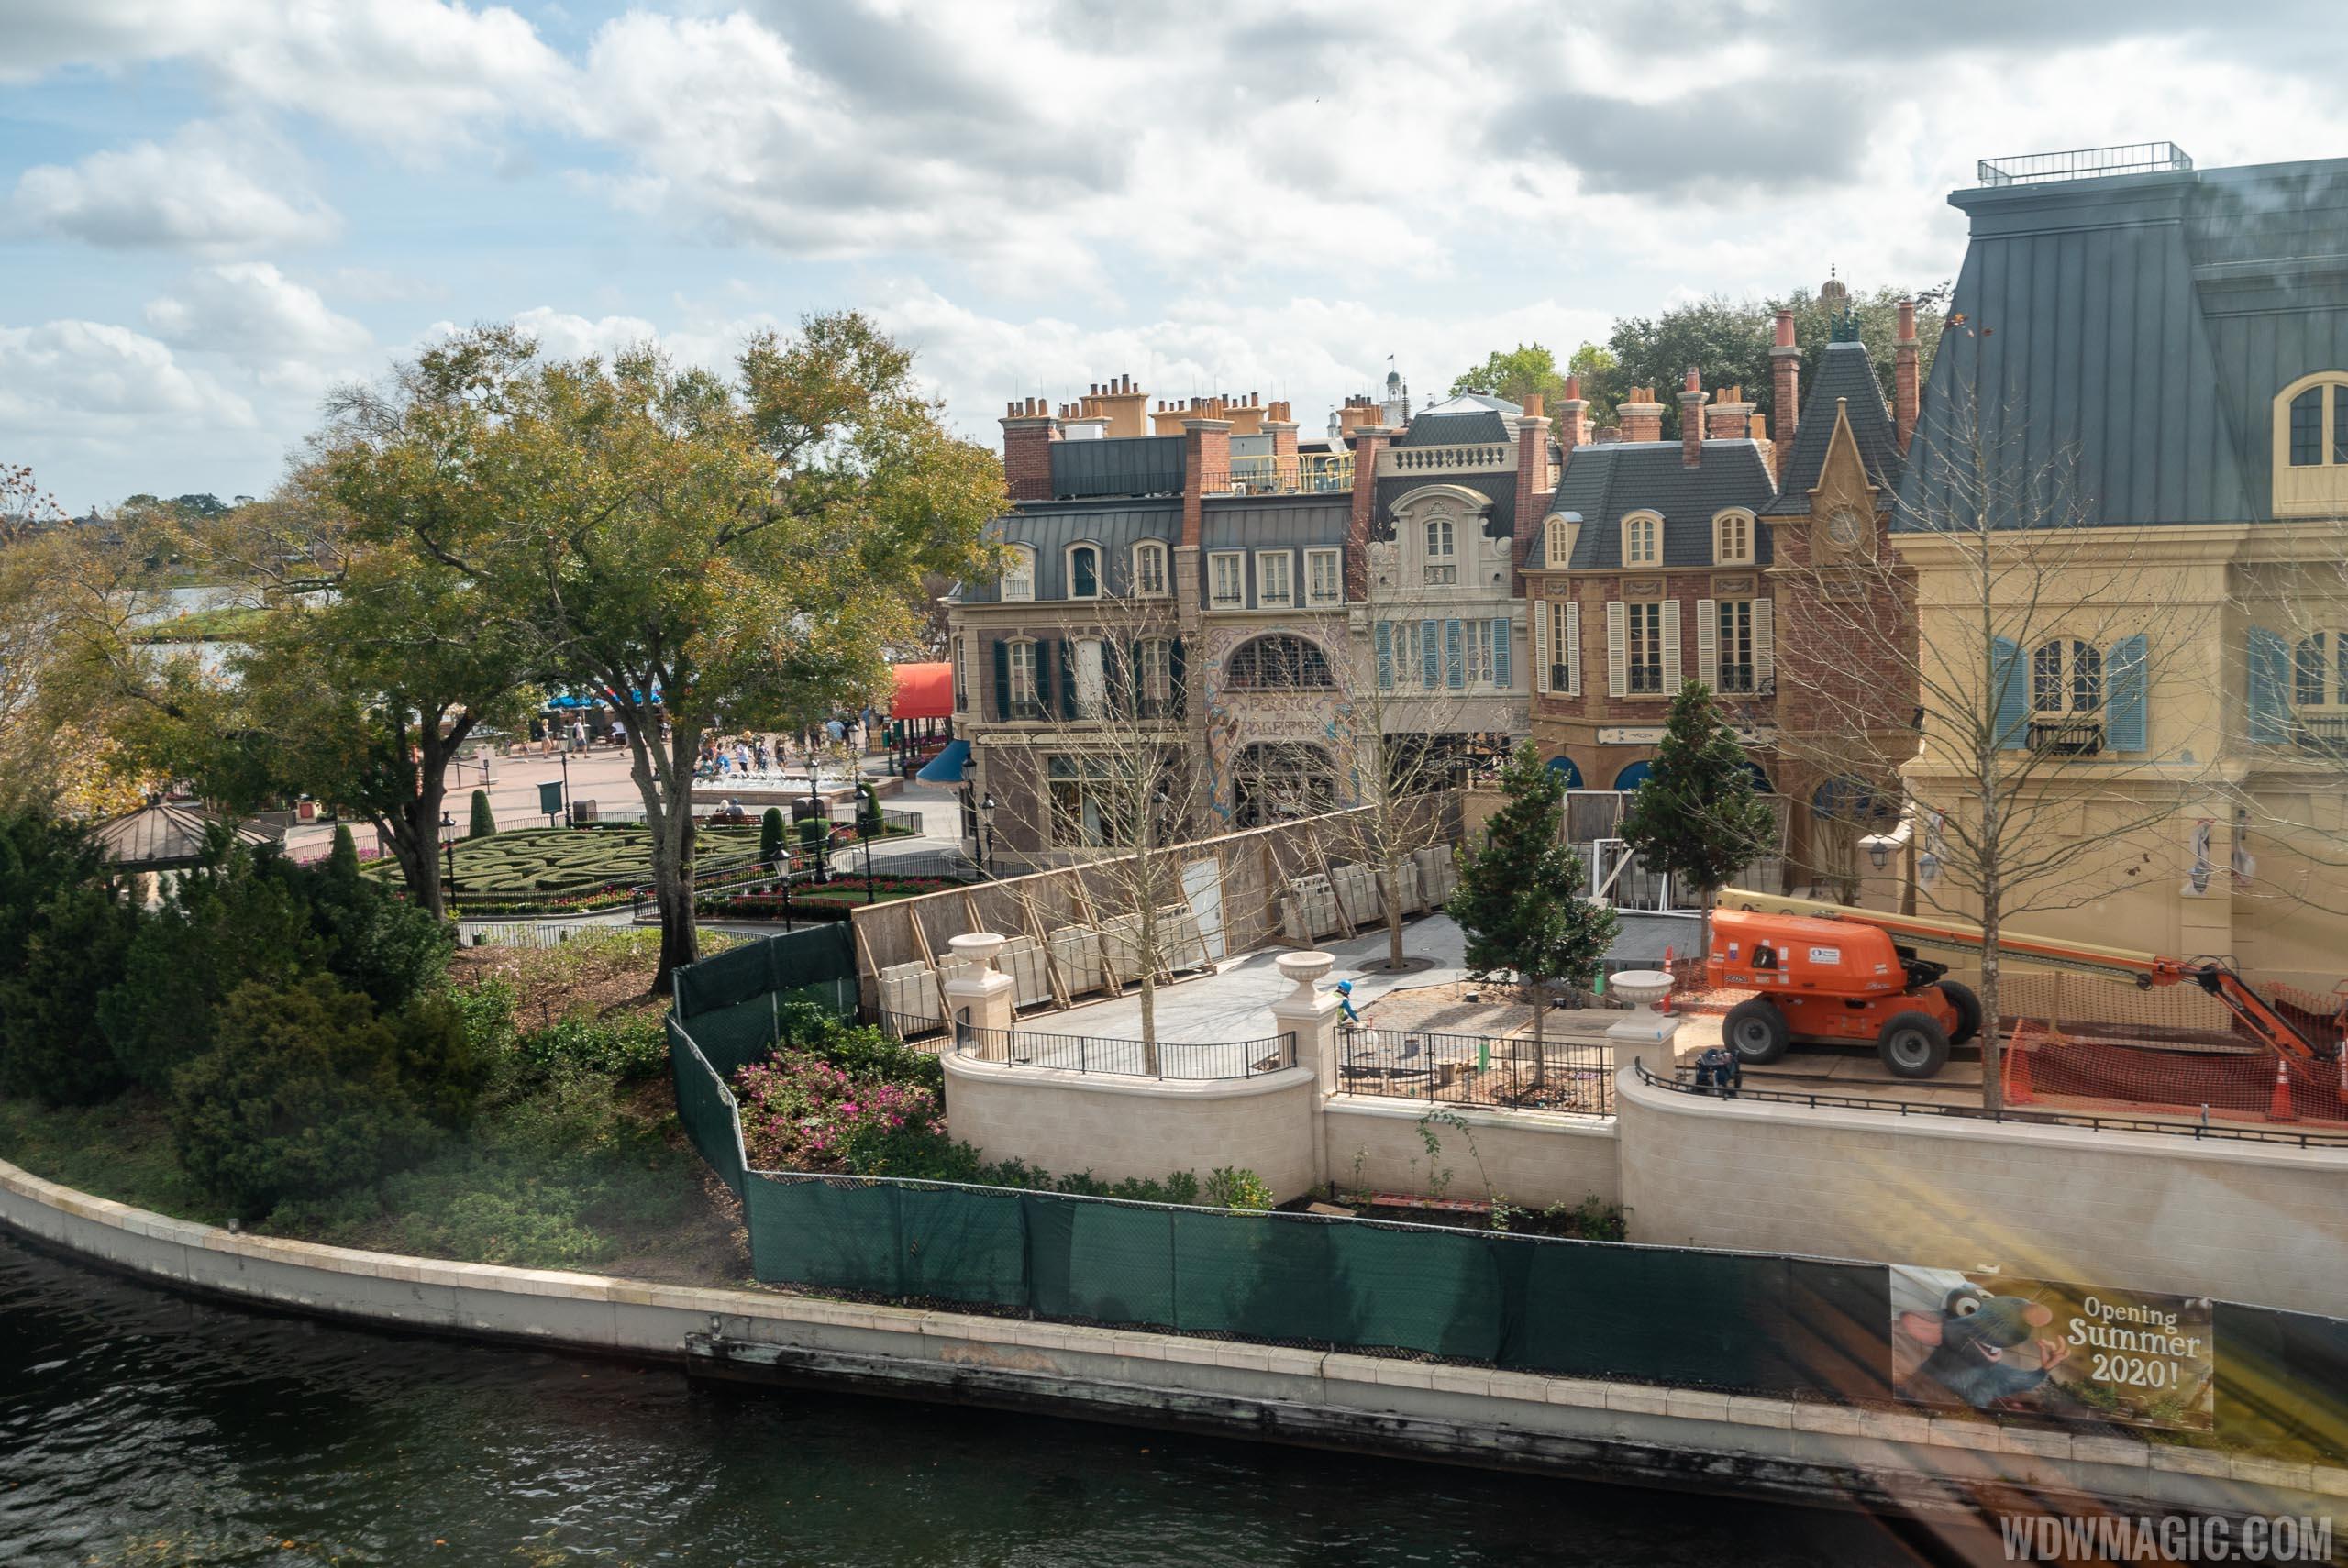 Remy's Ratatouille Adventure construction - February 2020